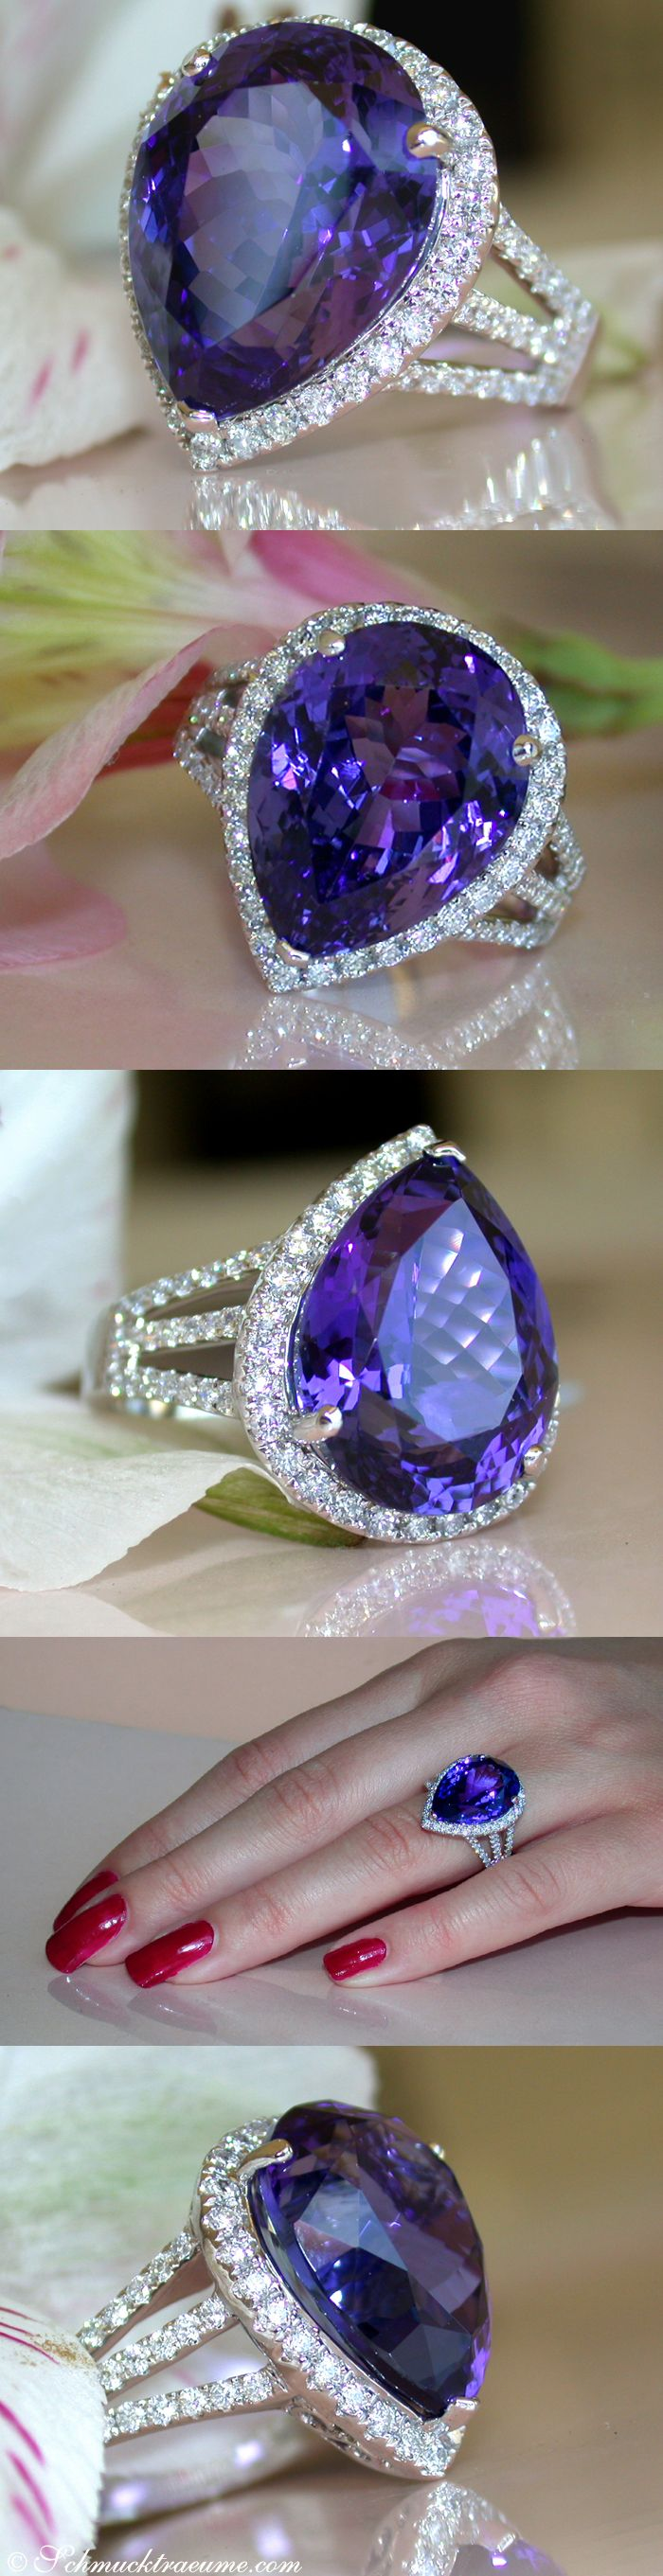 High-End: Huge Tanzanite Diamond Ring, 12,14 cts. WG-18K -- Find out: schmucktraeume.com - Like: https://www.facebook.com/pages/Noble-Juwelen/150871984924926 - Contact: info@schmucktraeume.com